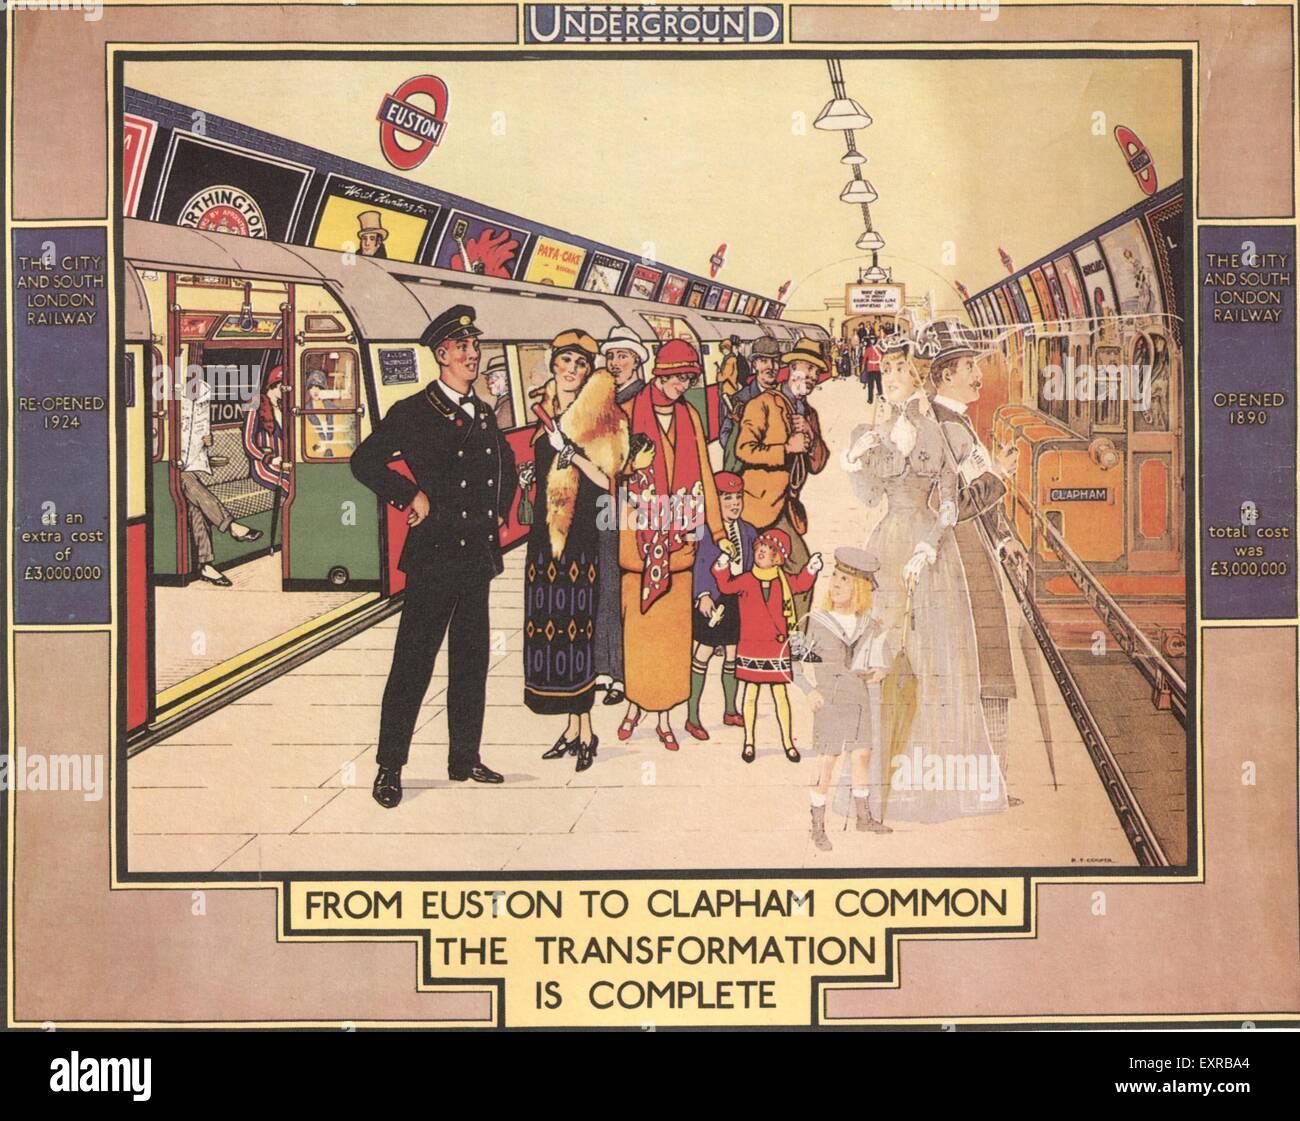 1920s UK The Underground Trains Poster - Stock Image